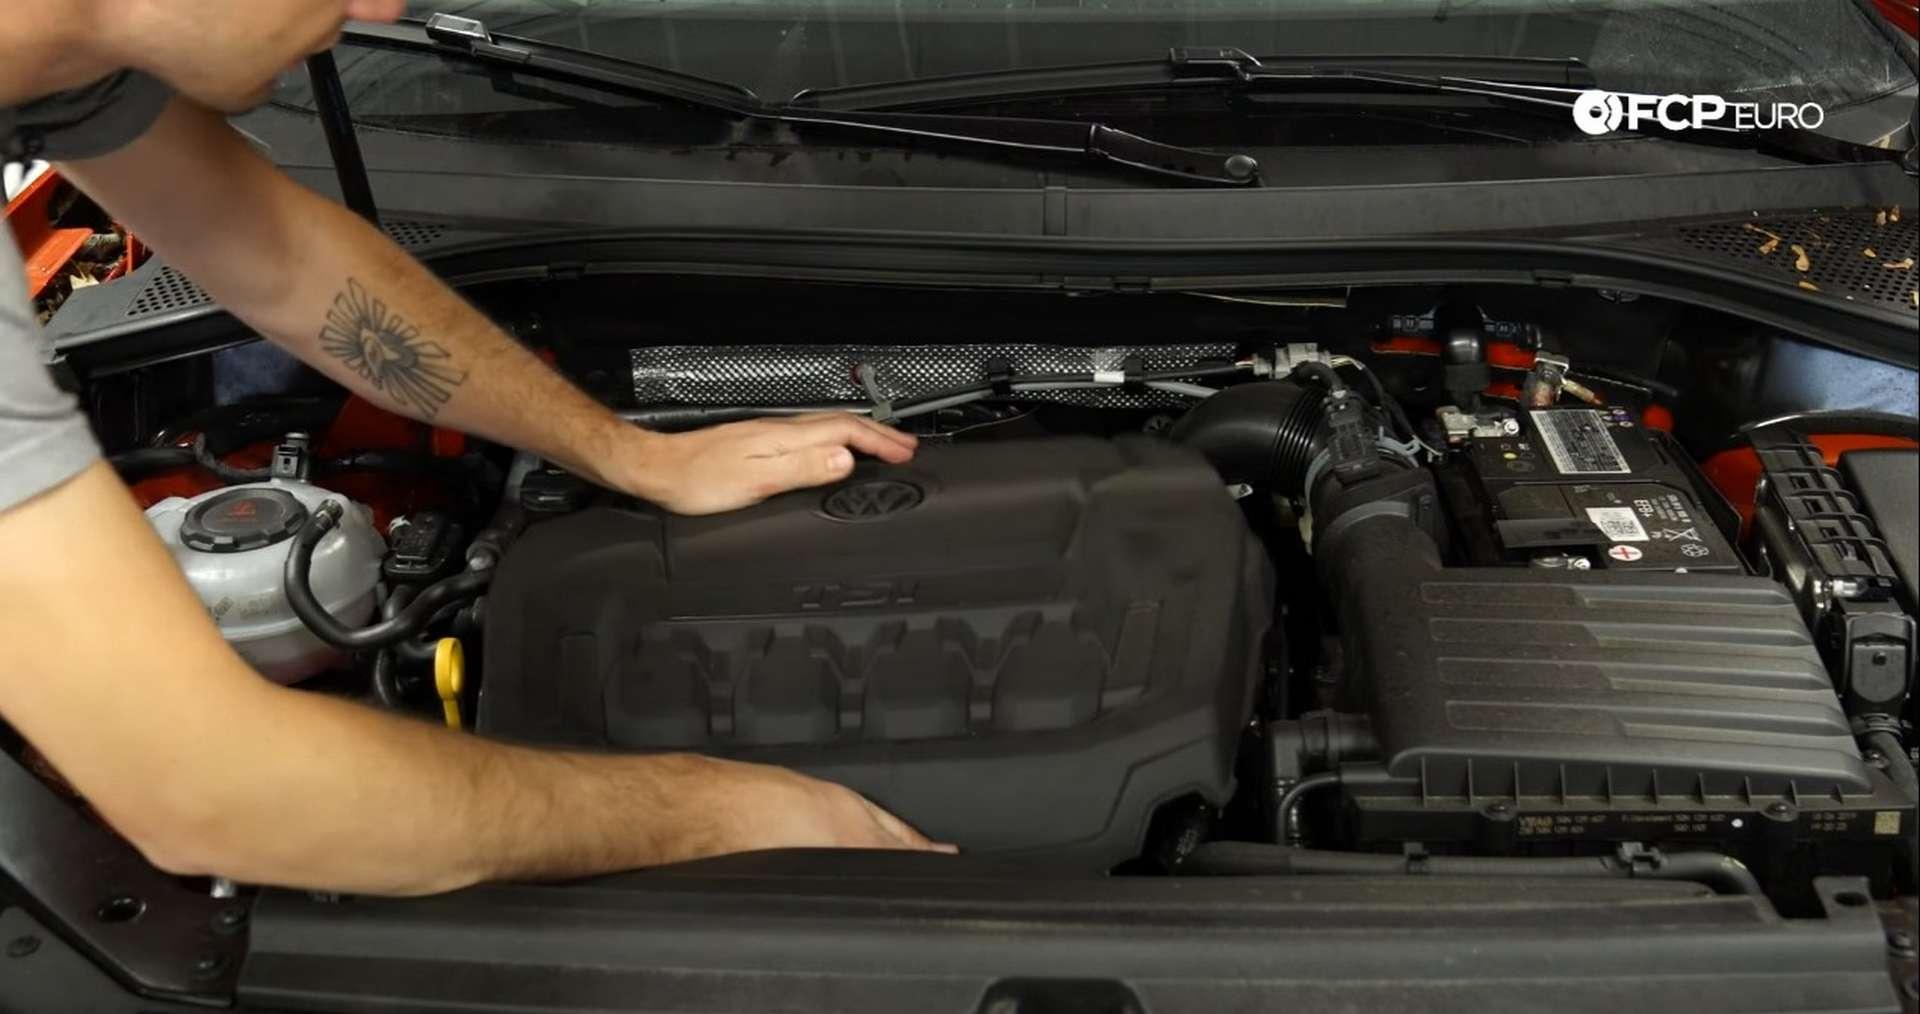 DIY Volkswagen EA888 Oil Change refitting the engine cover